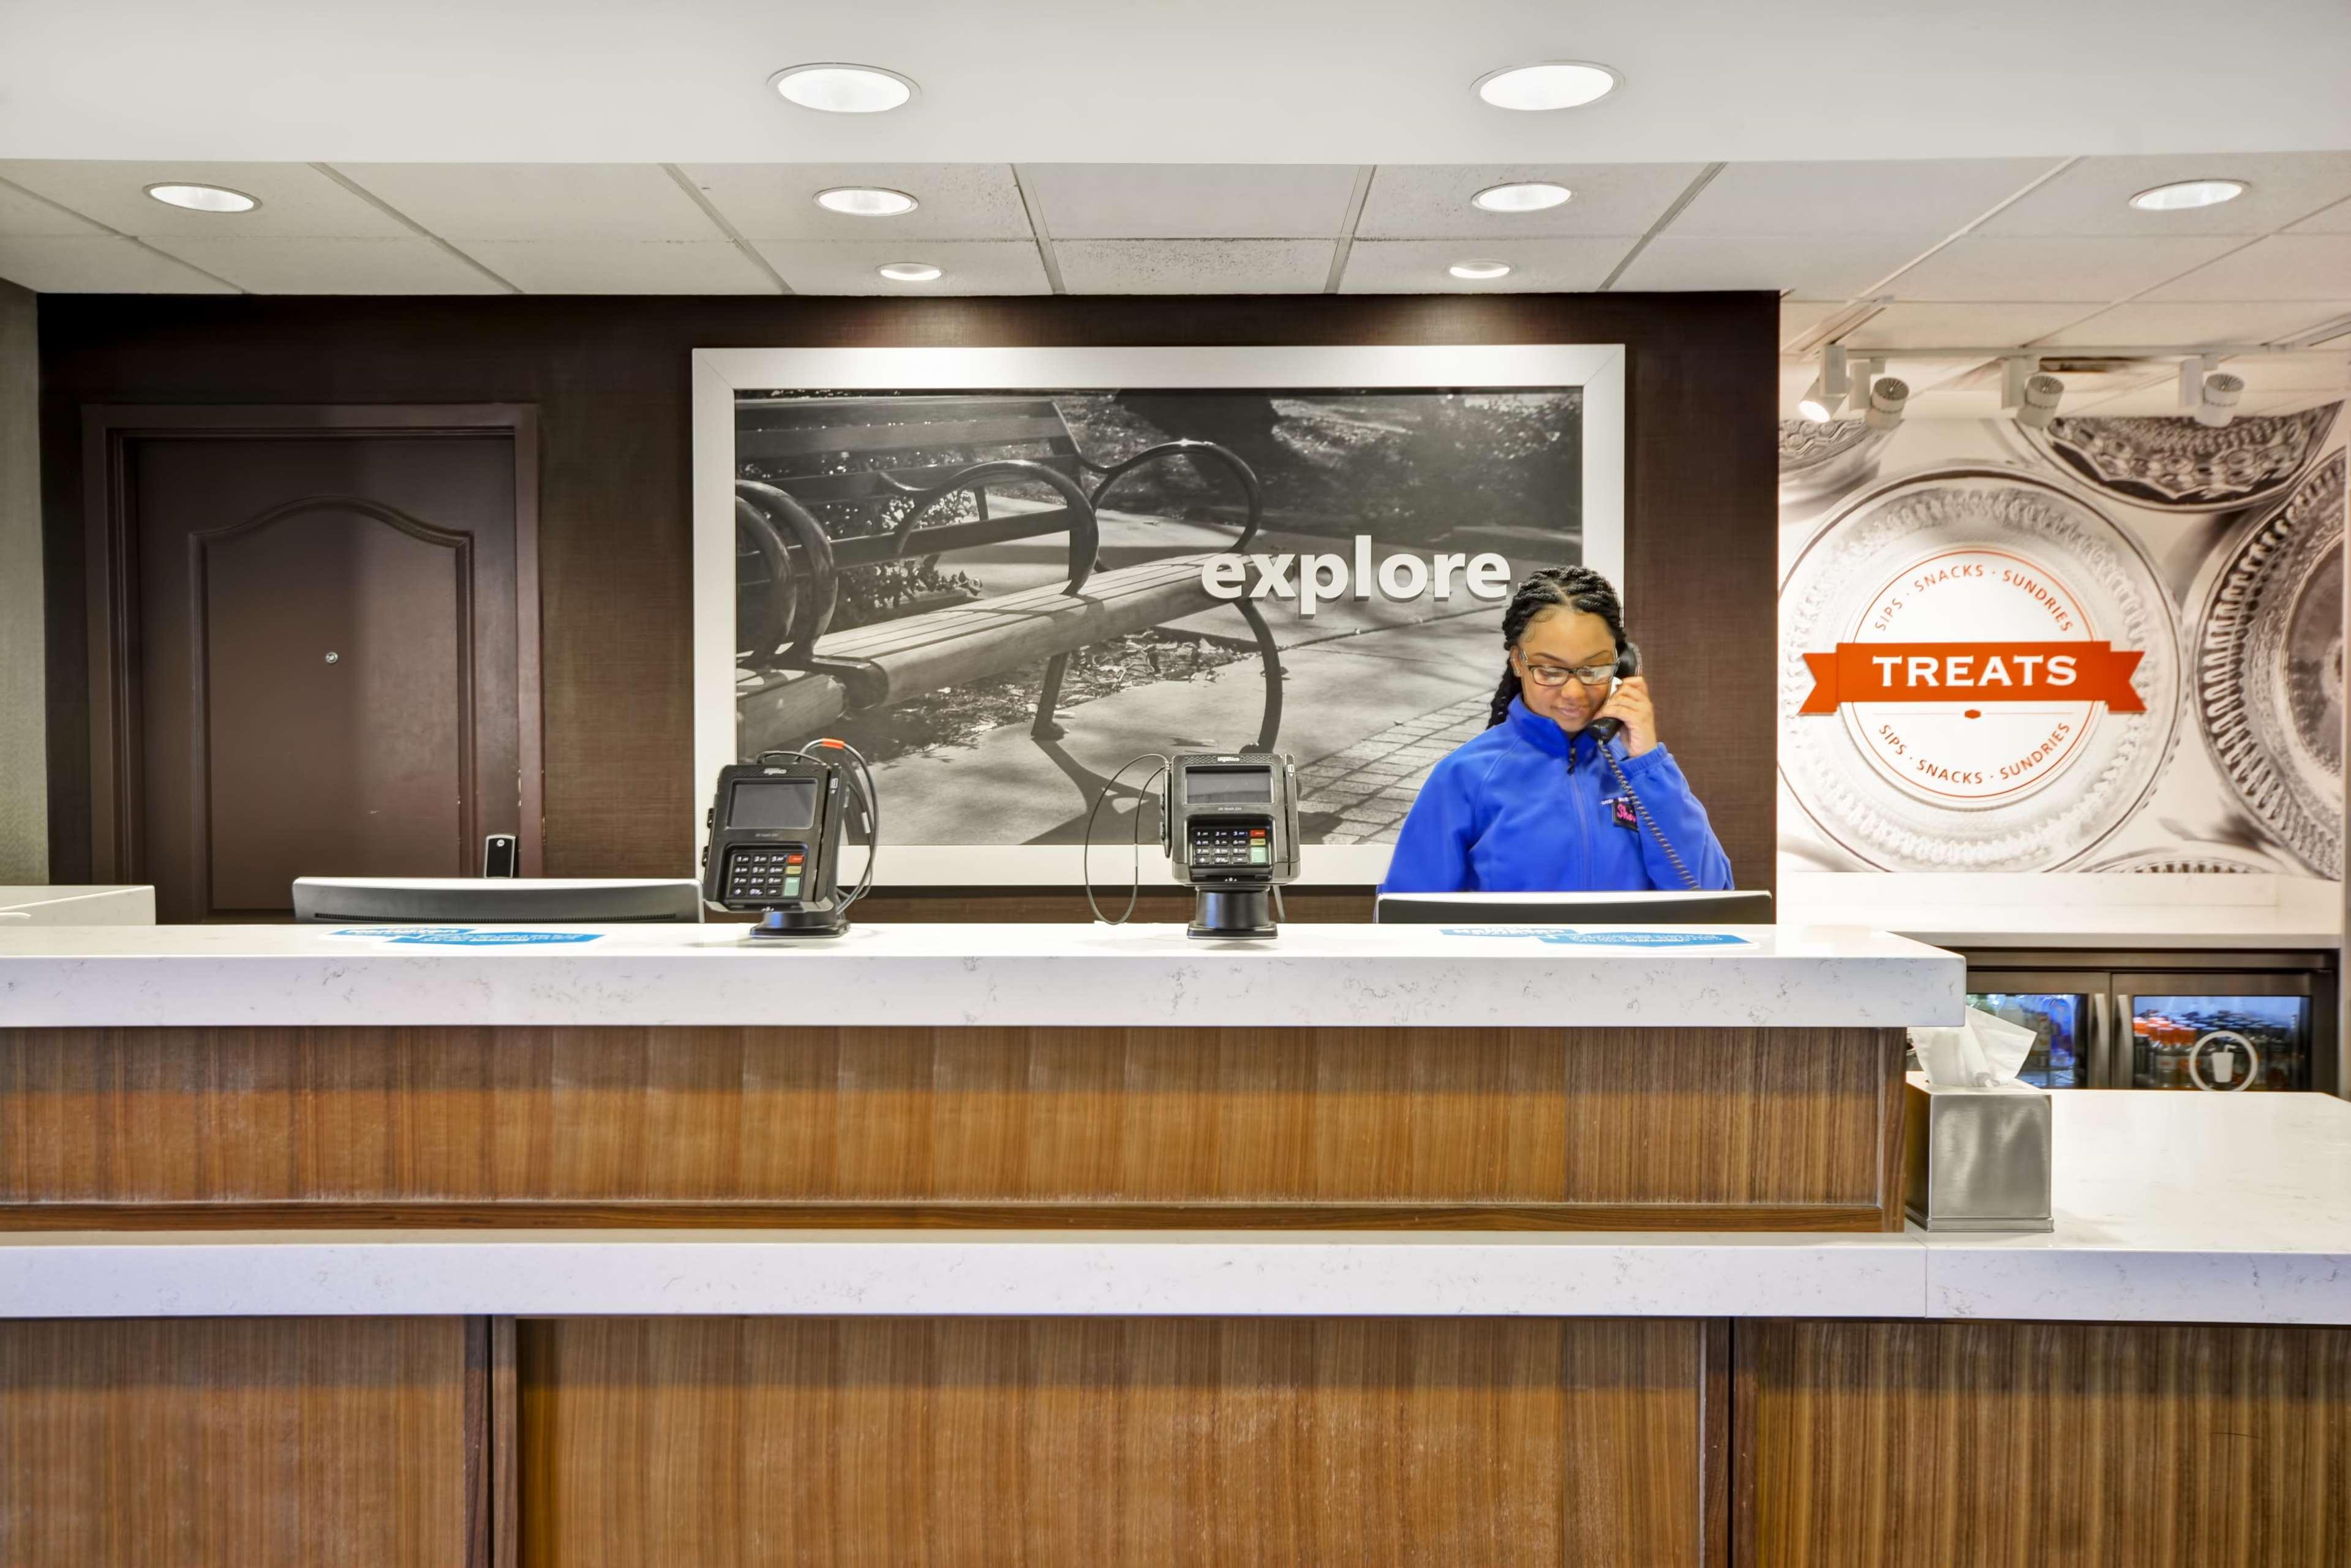 Hampton Inn & Suites Columbus-Easton Area image 9